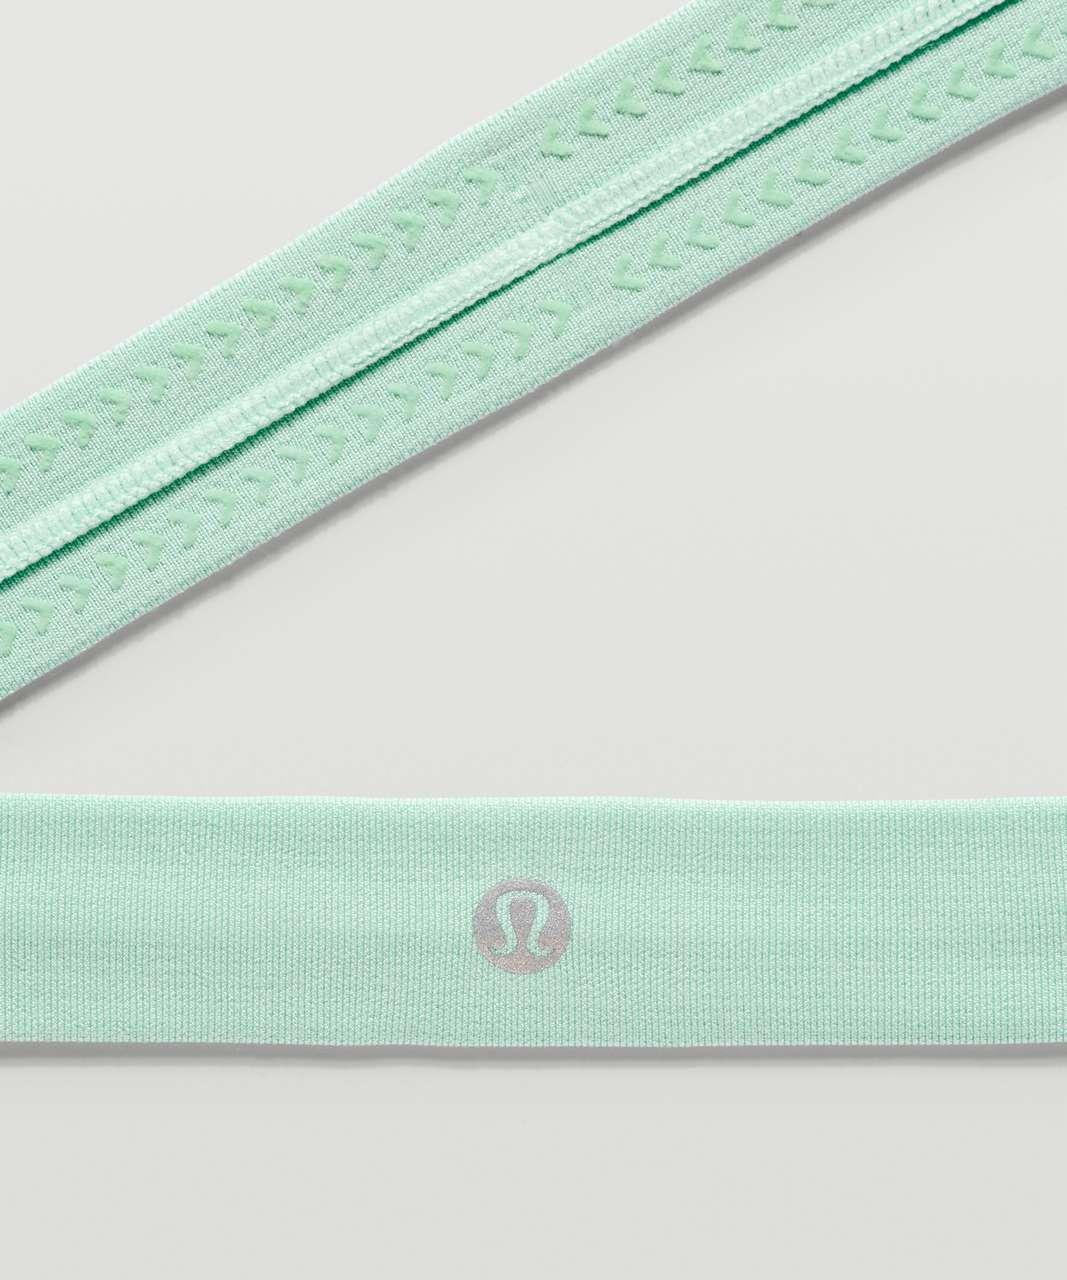 Lululemon Cardio Cross Trainer Headband - Wild Mint